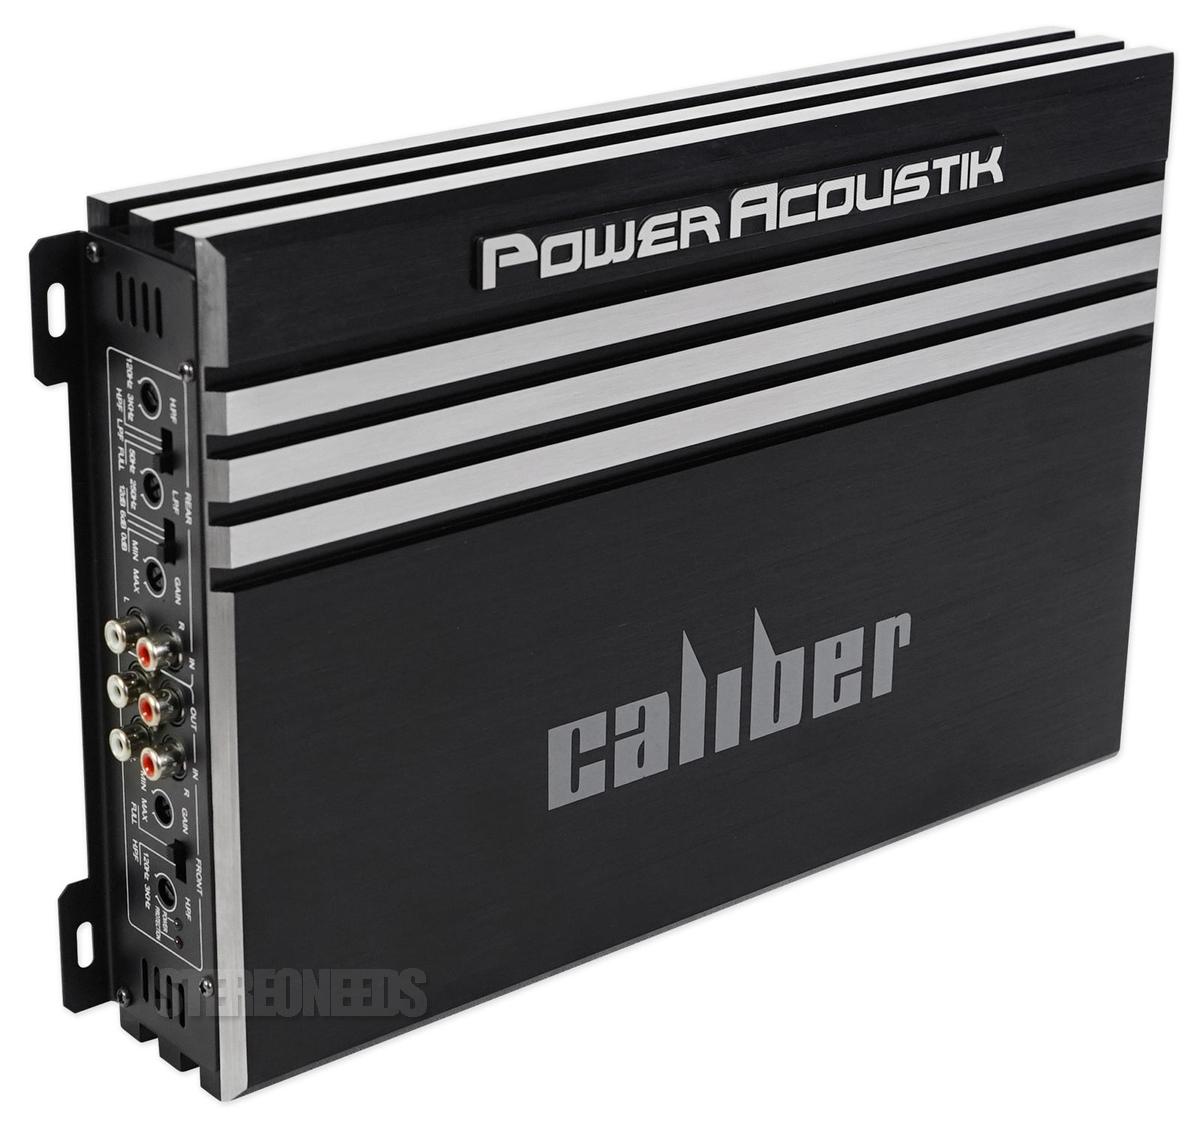 Power Acoustik RE4-1600D 1600 Watt 4-Channel Class A//B Car Stereo Amp Amplifier